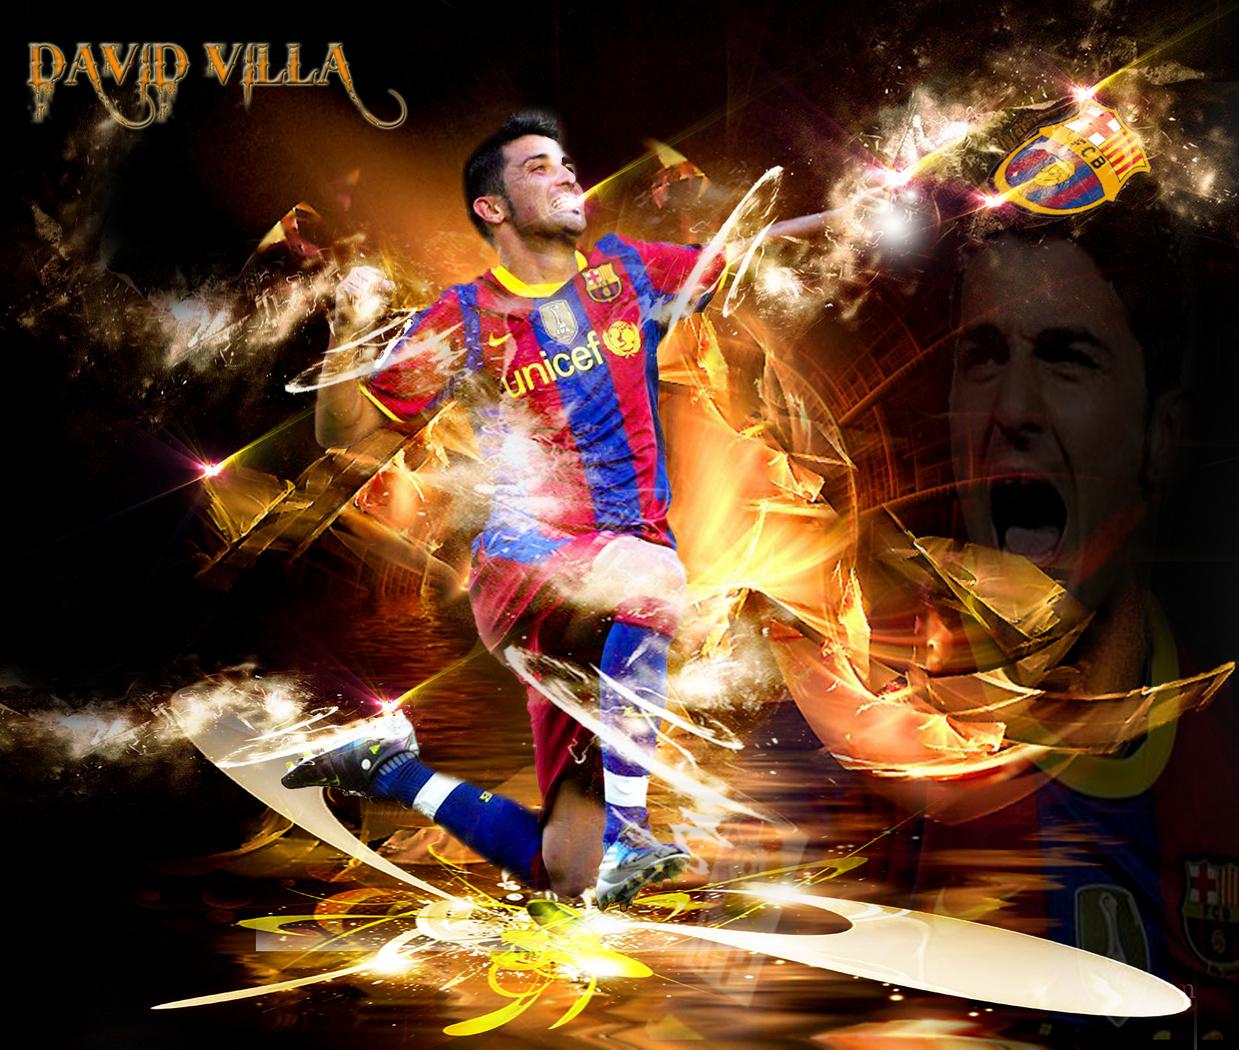 http://4.bp.blogspot.com/-wxHQ3eAGzFw/UD920X7yqLI/AAAAAAAAARM/5jCUwawA73A/s1600/David+Villa+new+Wallpaper+2012+08.jpg